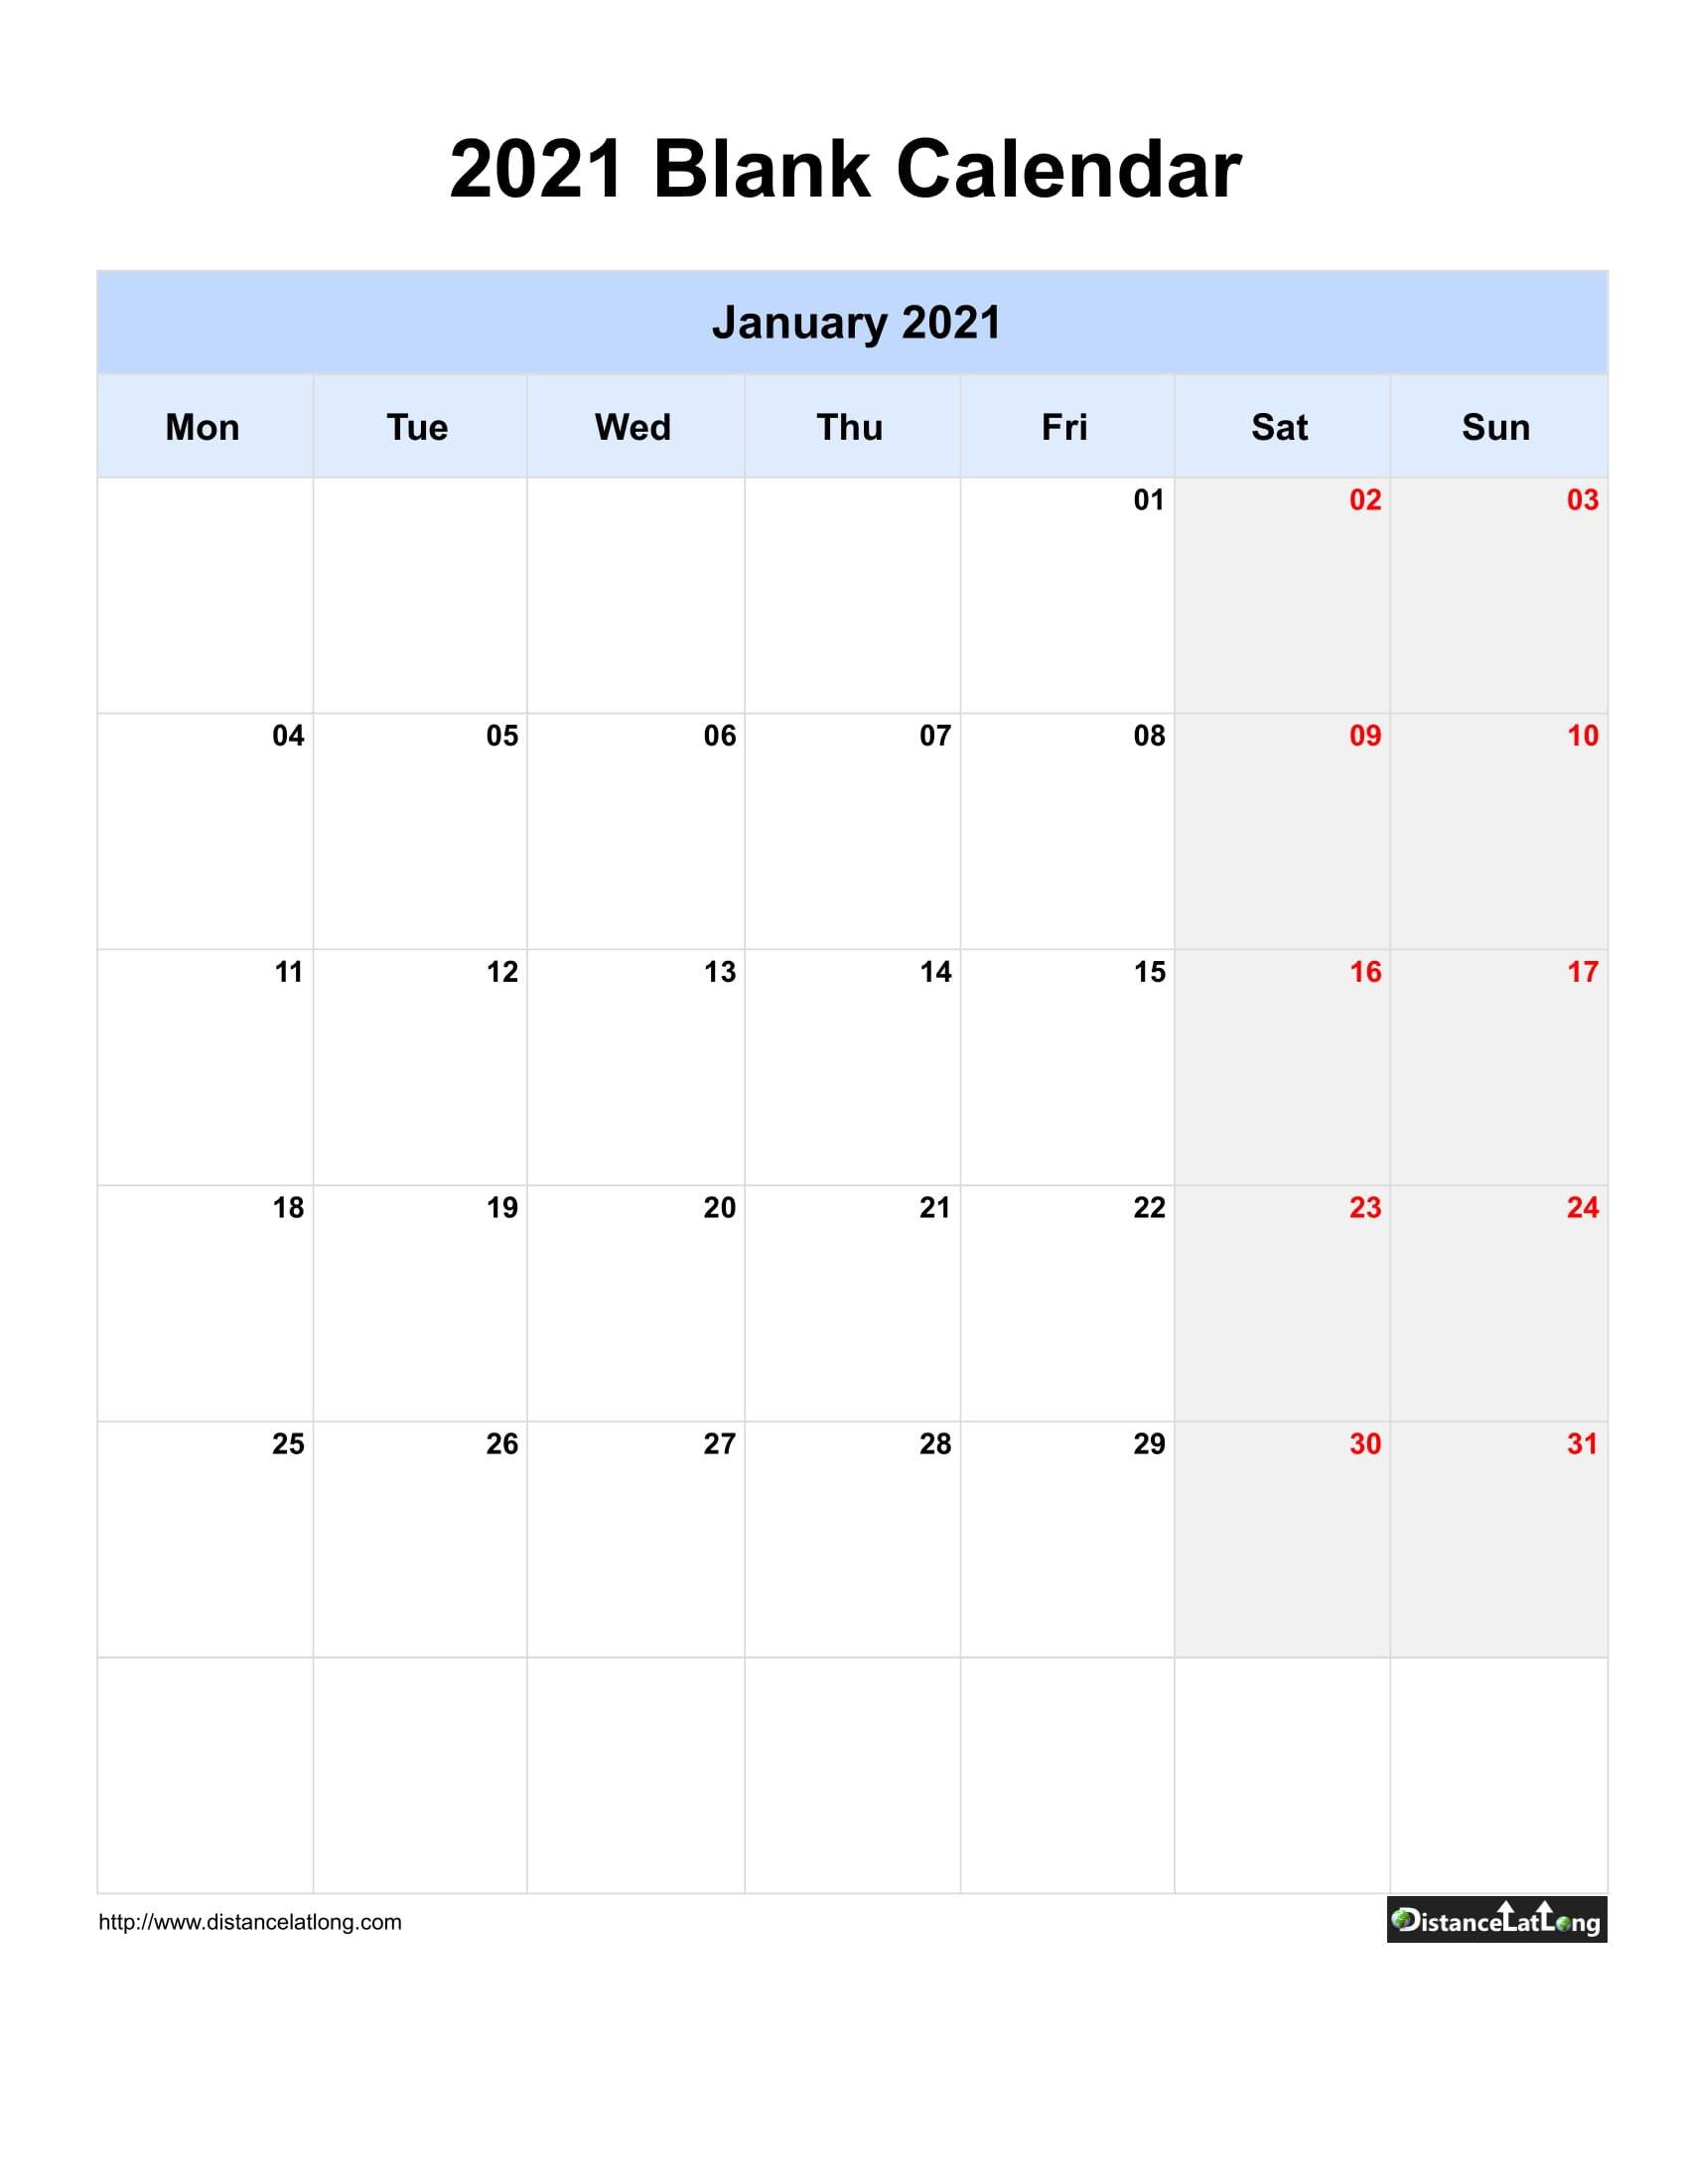 Downloads: 0 Version: 2021 File Size: 108 Kb One Week Monday Through Saturday Communication Calendar